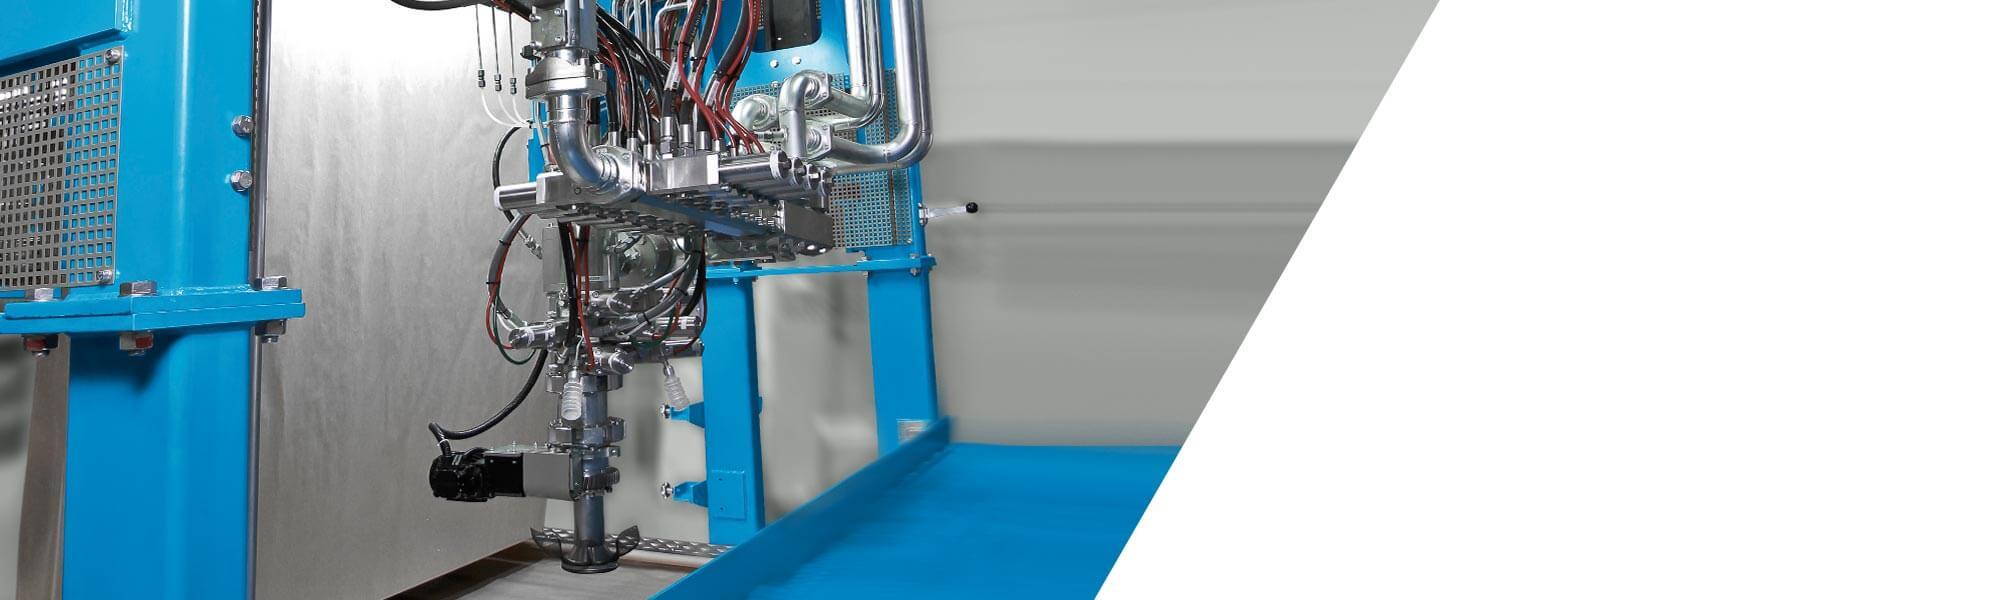 Dynamic stirrer mixer for slabstock applications